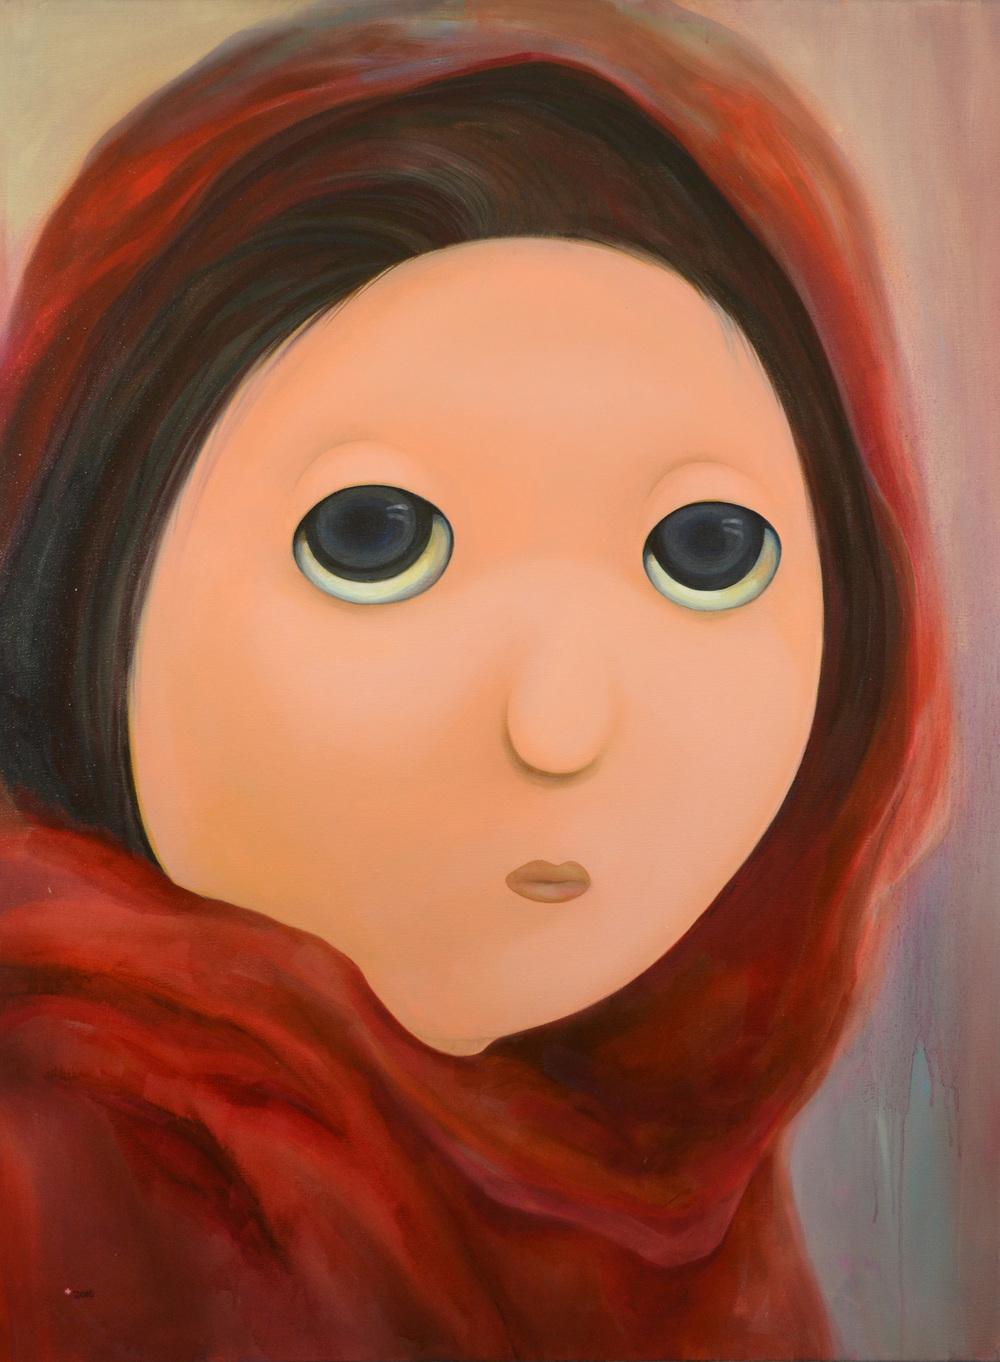 阿富汗少女Afghan girls